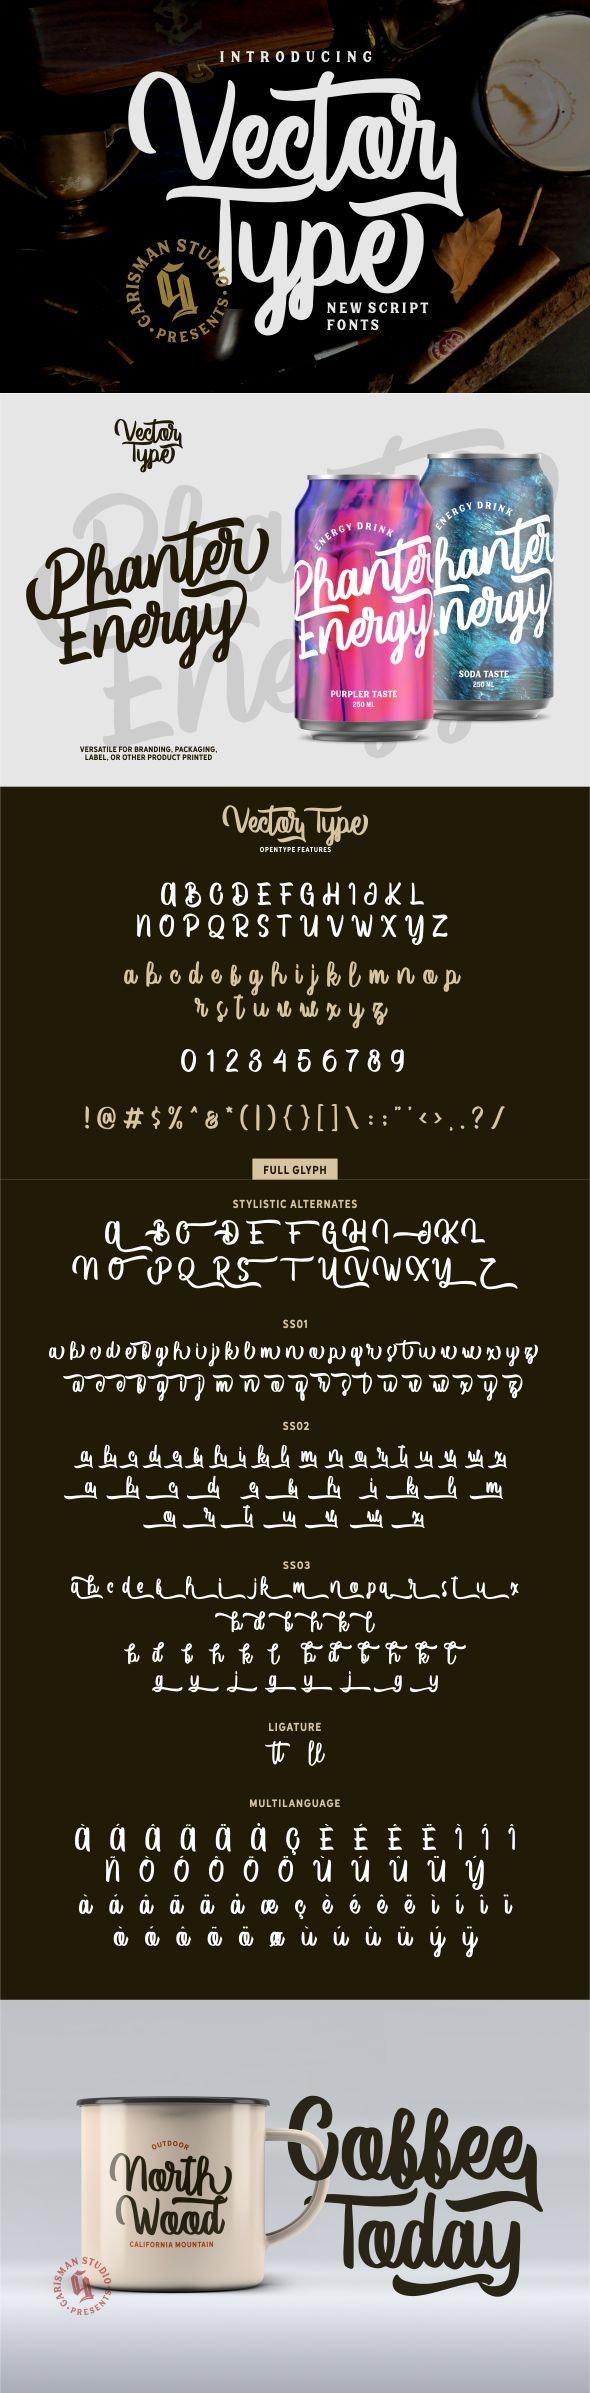 Vector Type - Hand-writing Script